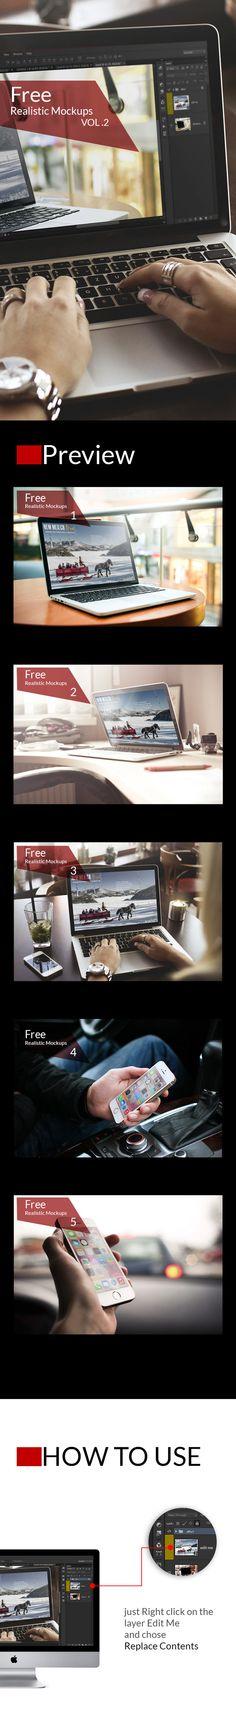 free-psd-realistic-apple-device-mockups